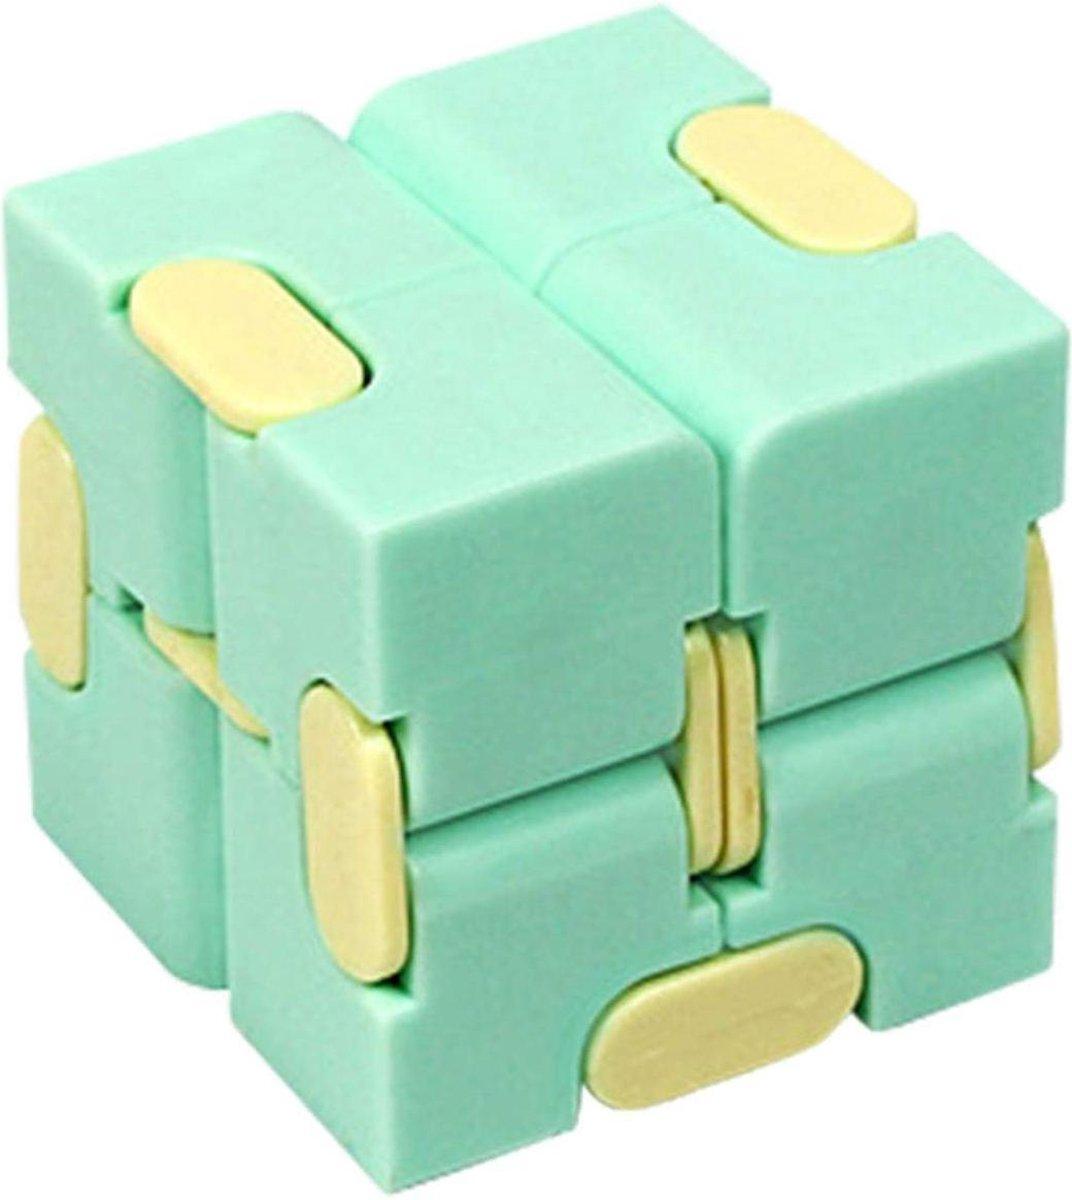 Infinite Magic Cube - Friemelkubus - Infinity Cube - Fidget gadget - Anti stress Fidget Spinner - St